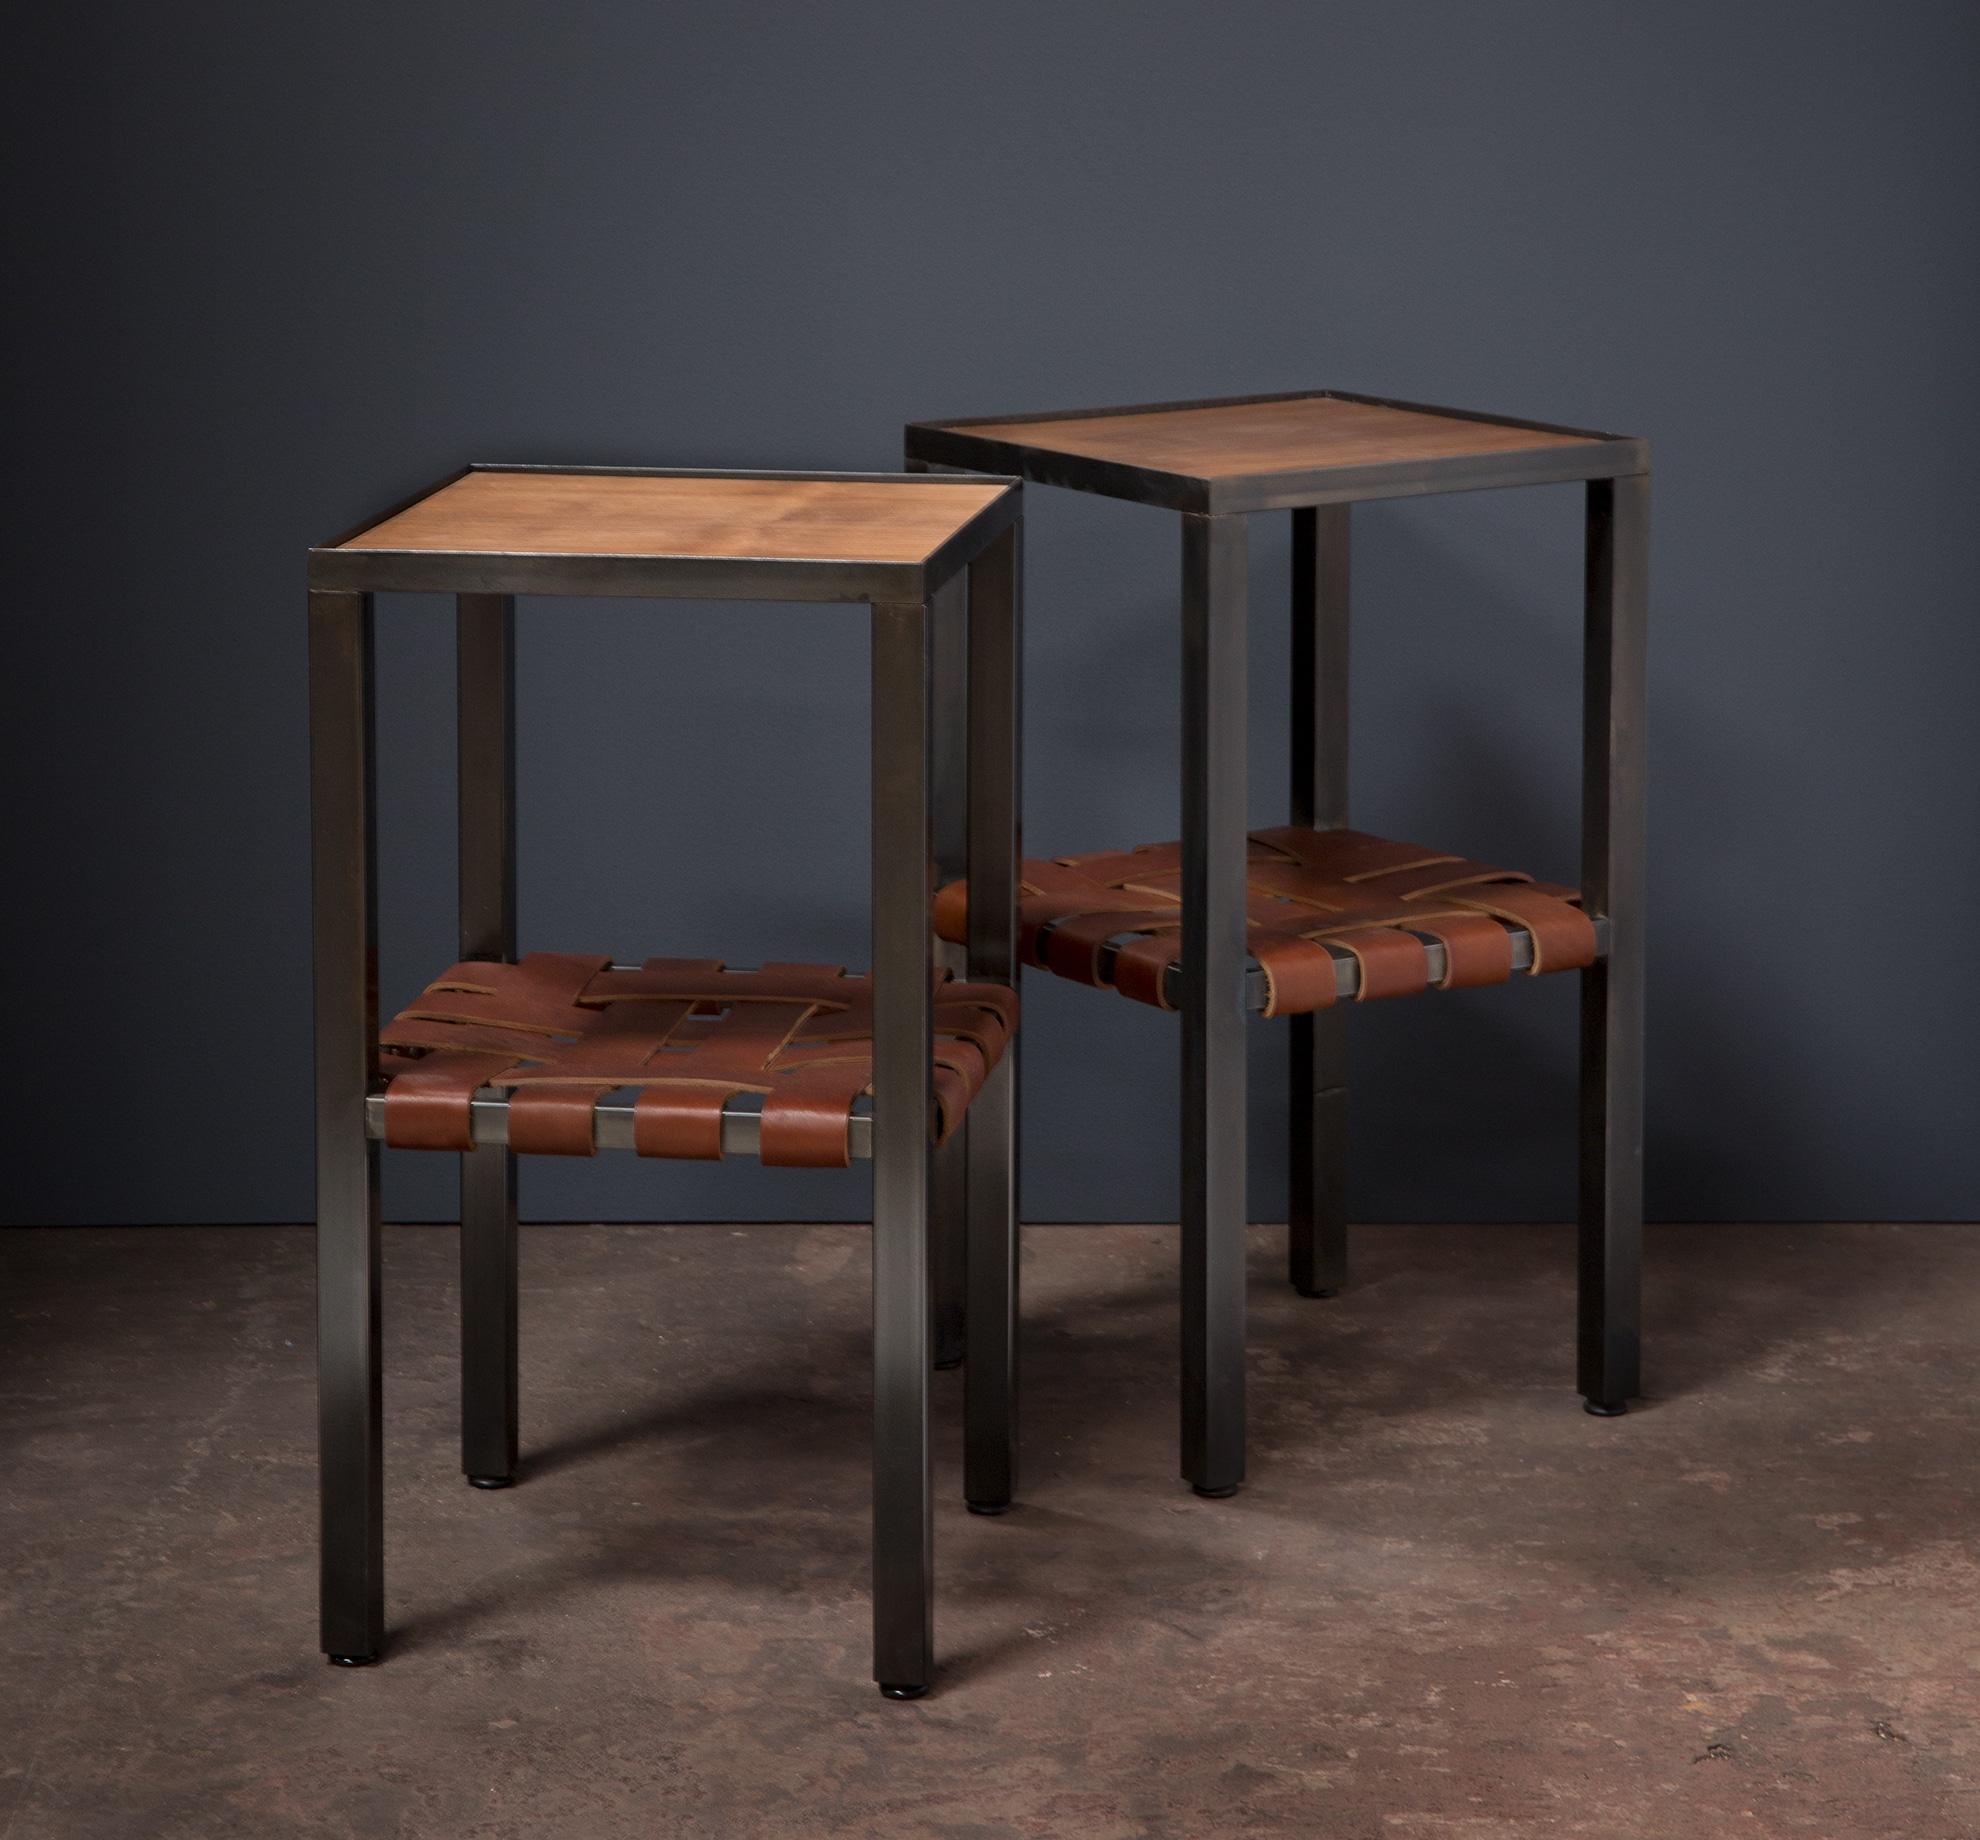 leather and steel nightstands, desk, wood, metalwork, metal work, metal fabrication, bay area metalworker